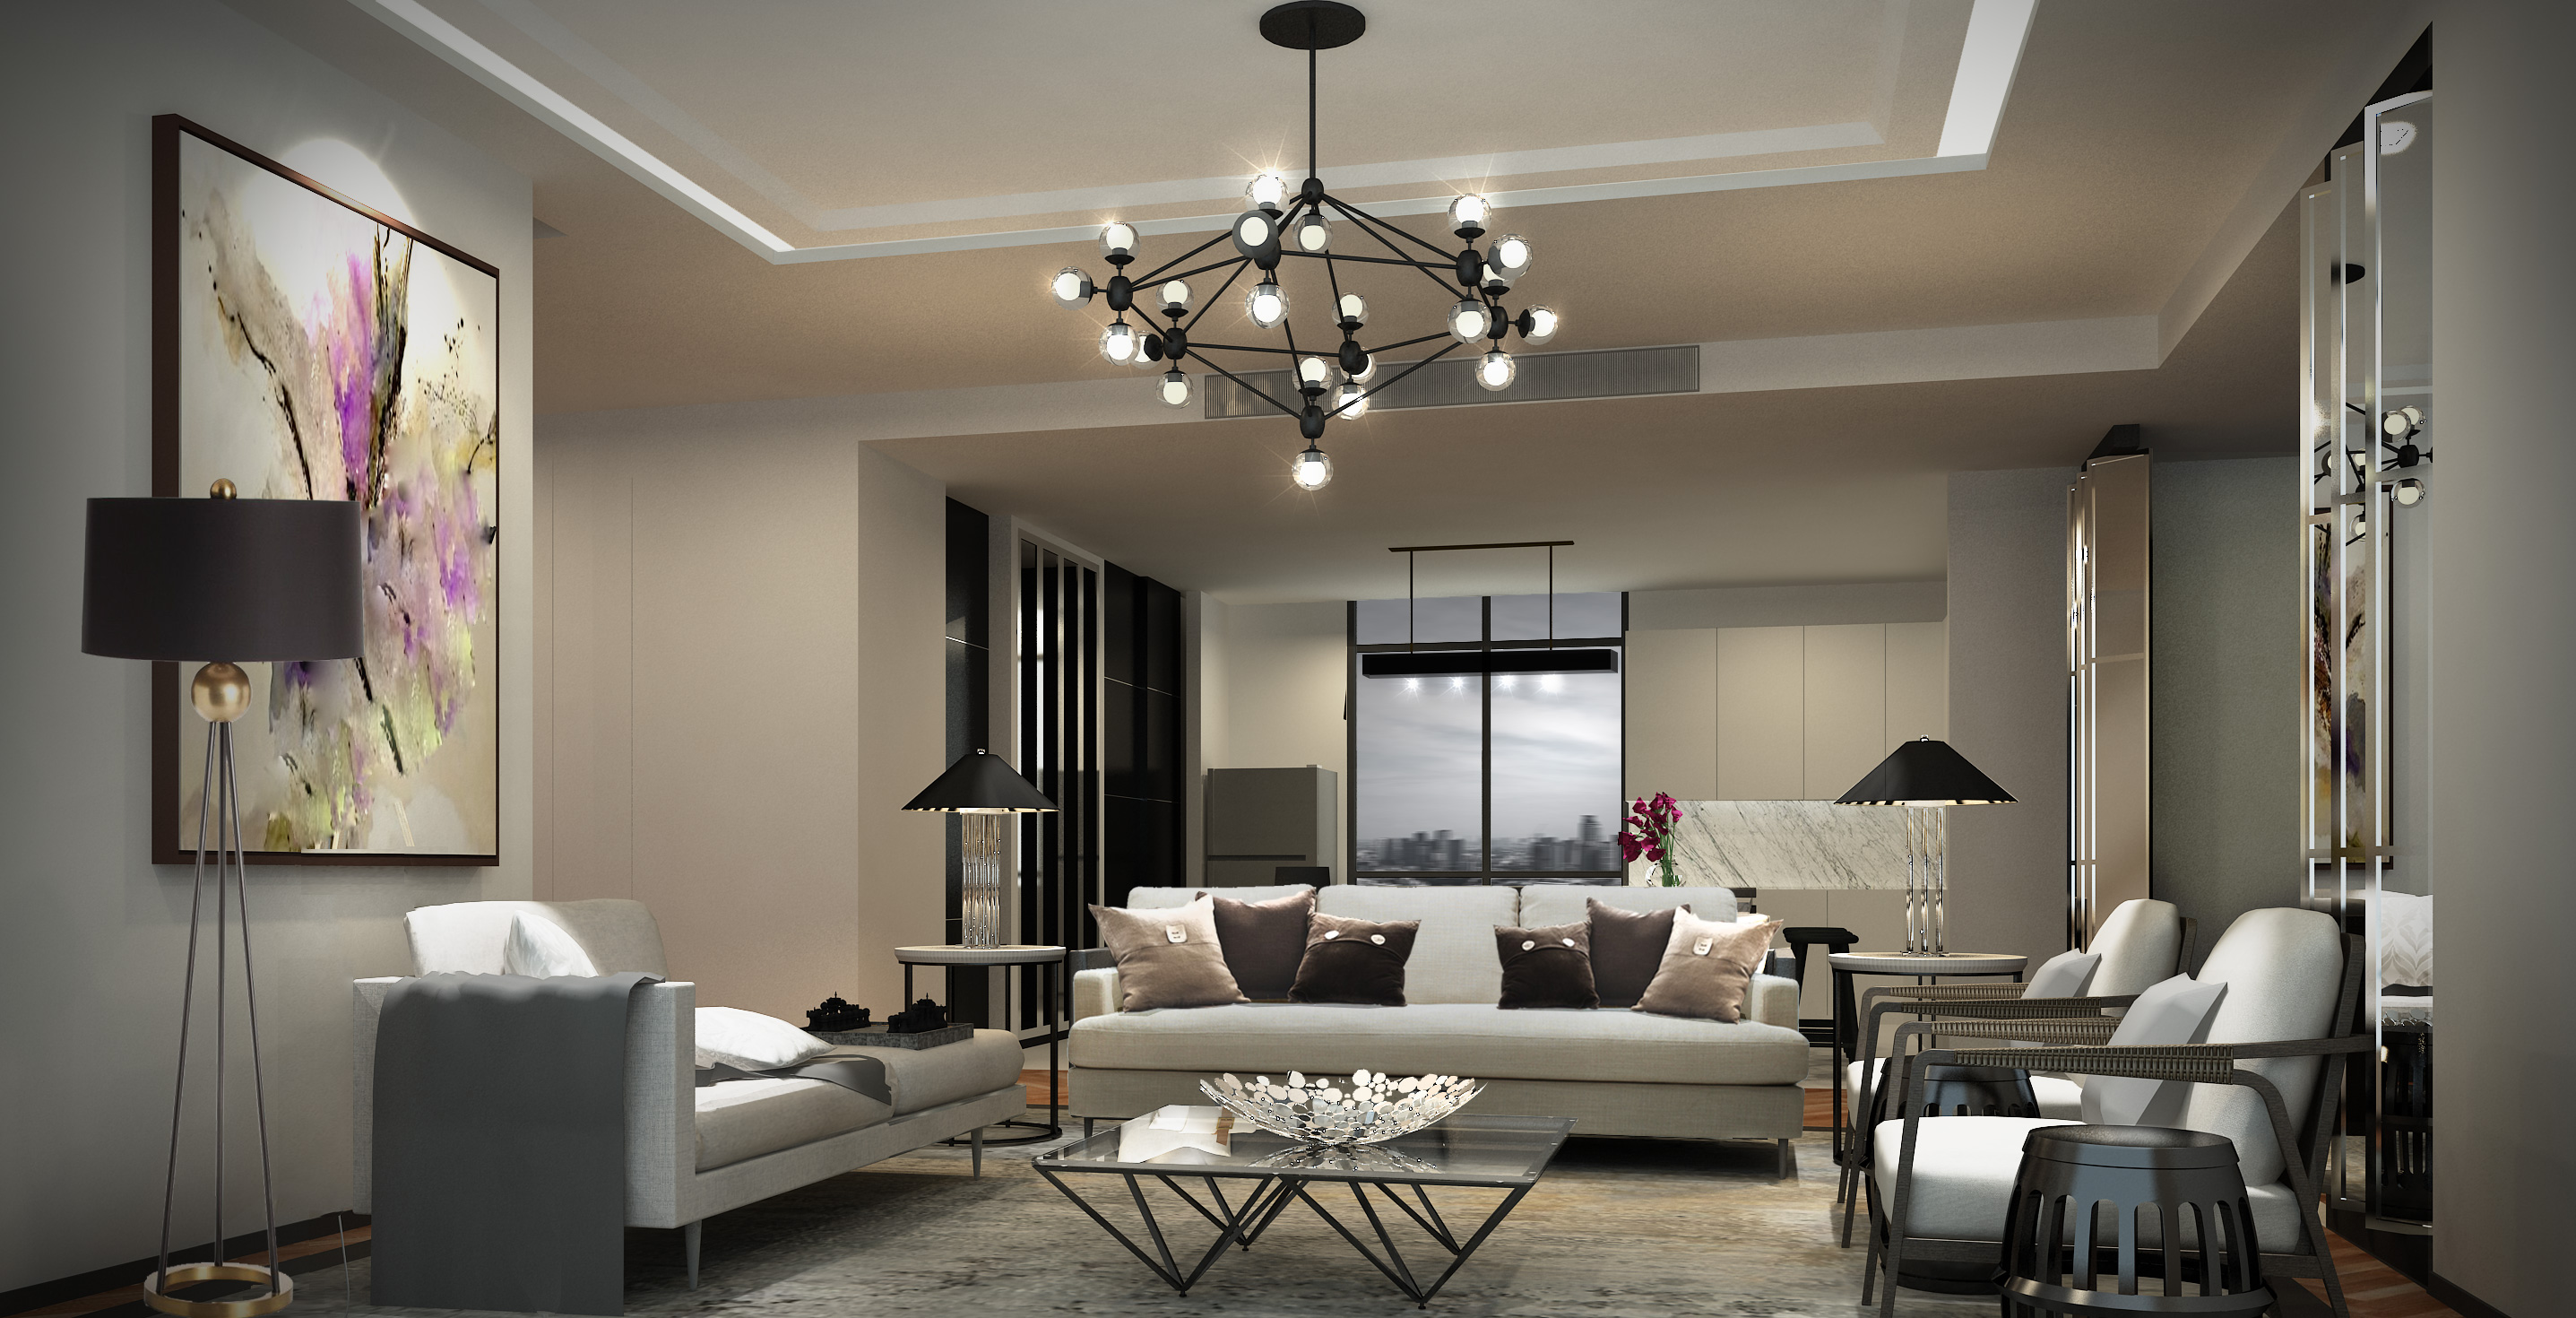 TBT-DAF interior design residence tony residence 1